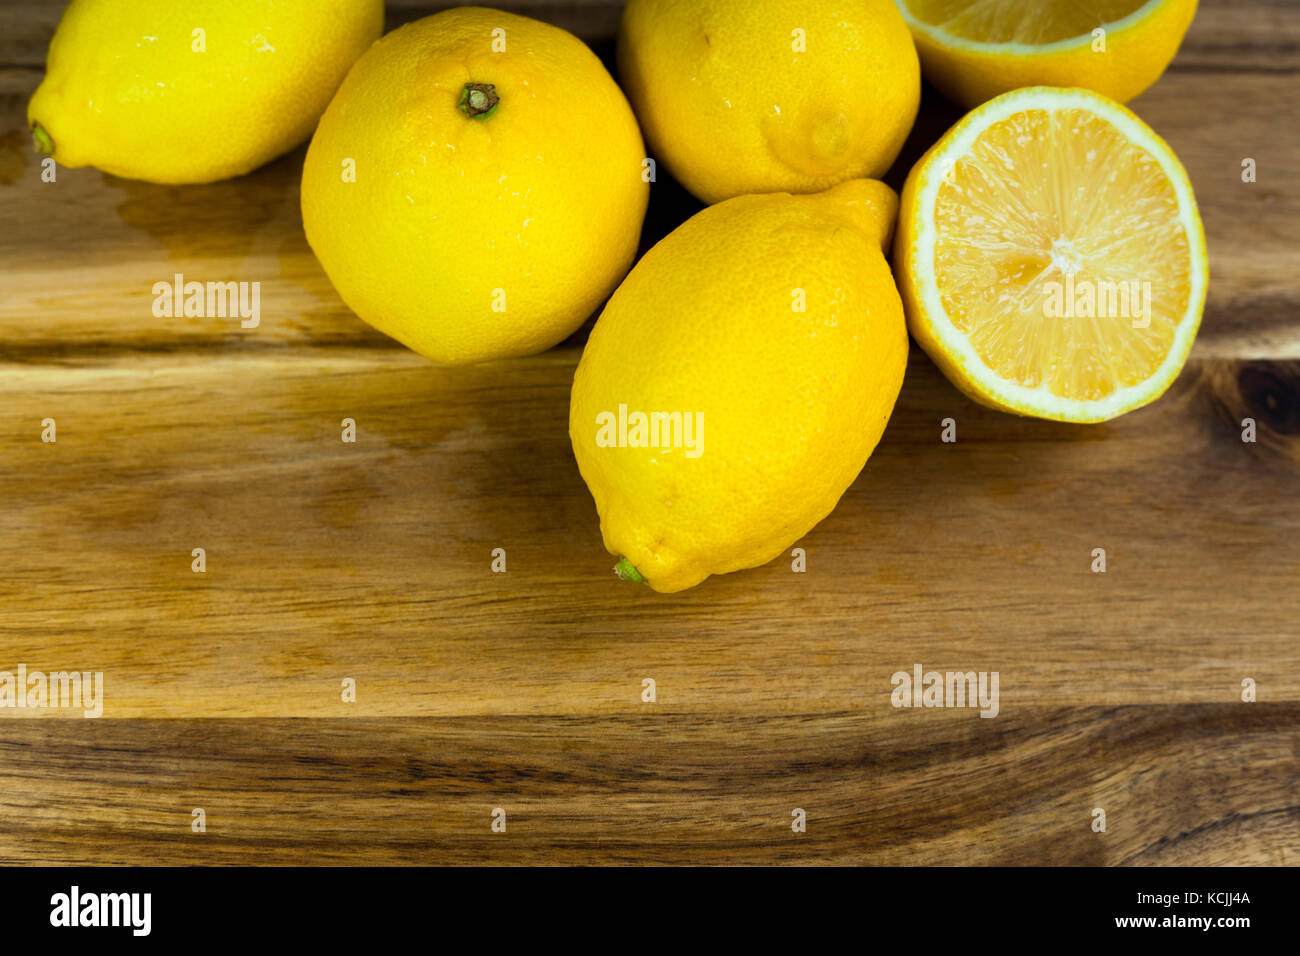 closeup photo of ripe yellow lemons - Stock Image